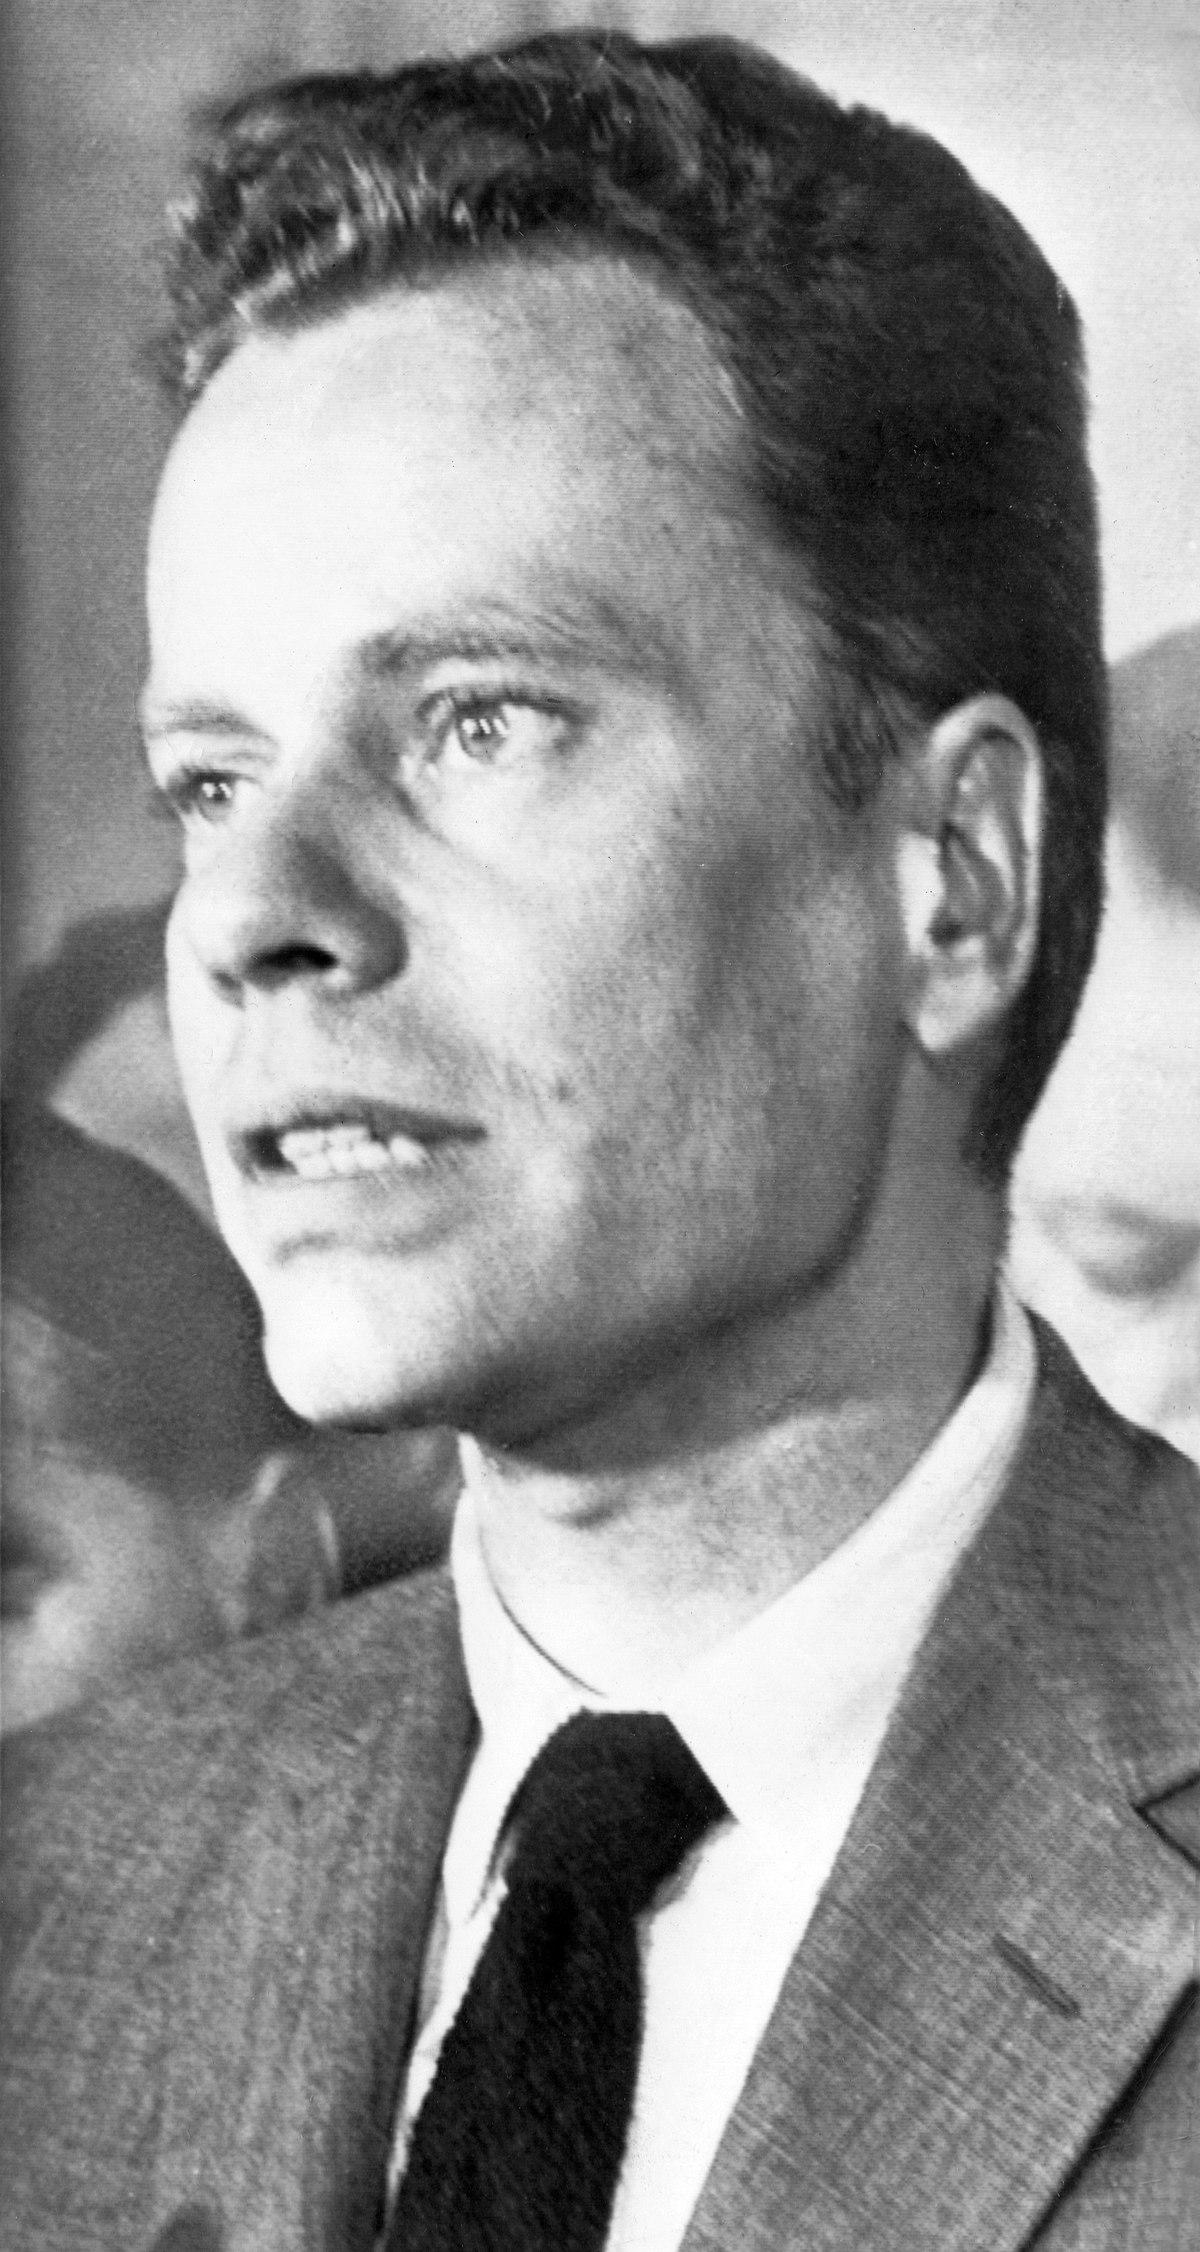 U 2 1959 Charles Van Doren - Wi...